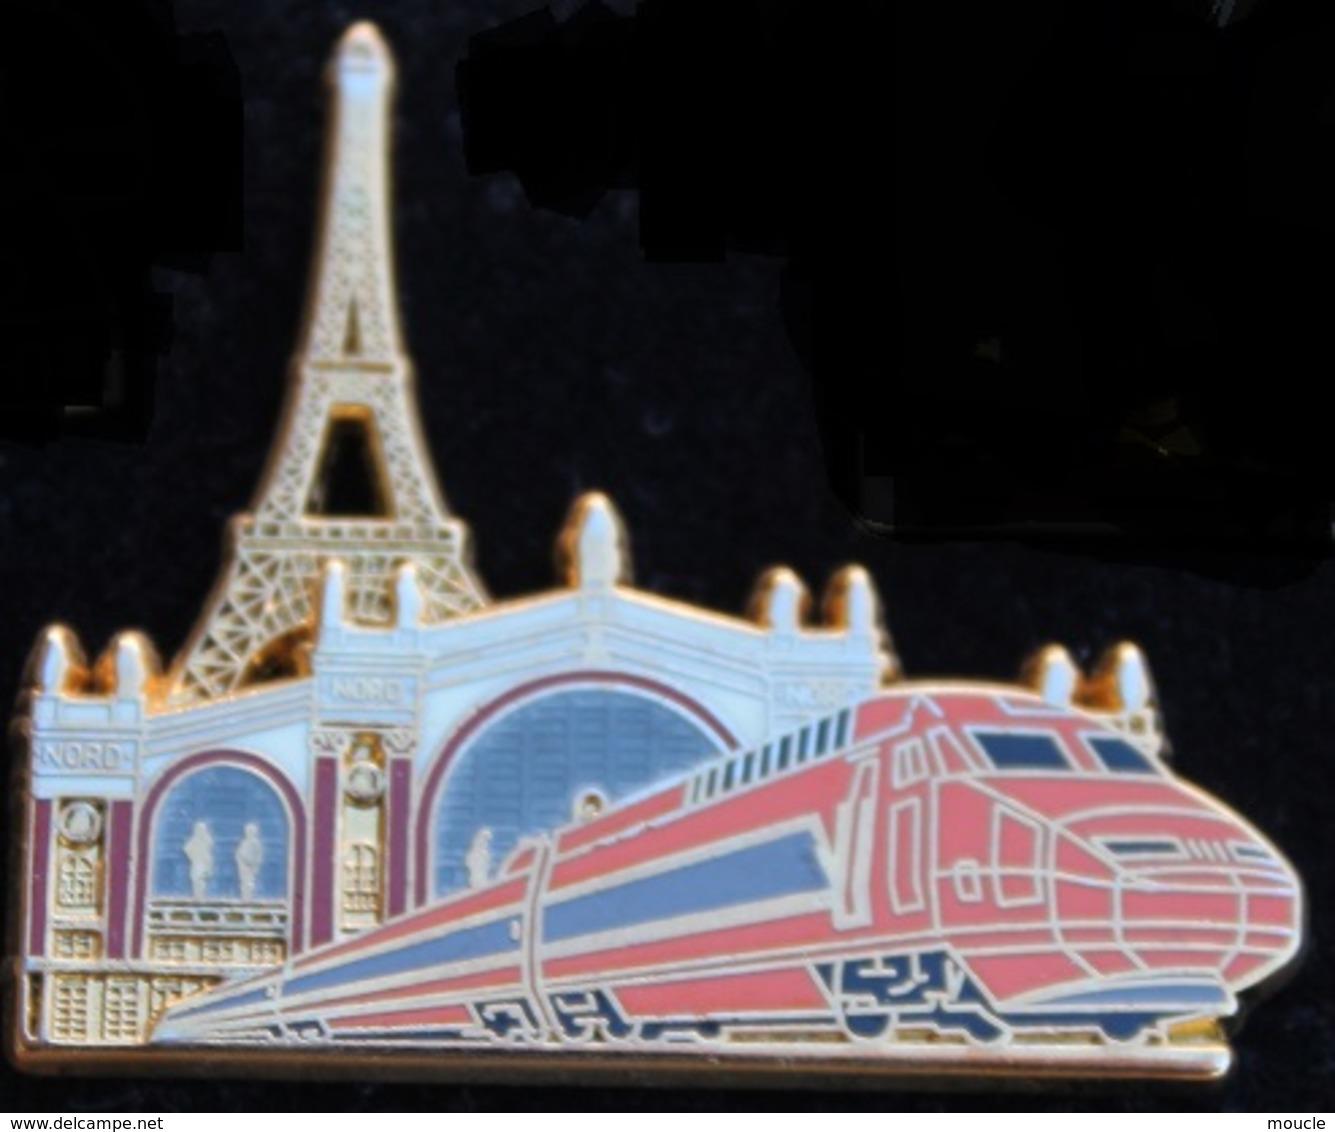 TGV - TRAIN  - LOCOMOTIVE ORANGE  TOUR EIFFEL - PARIS - BALLARD - DORE A L'OR FIN - COMBS LA VILLE -    (21) - TGV